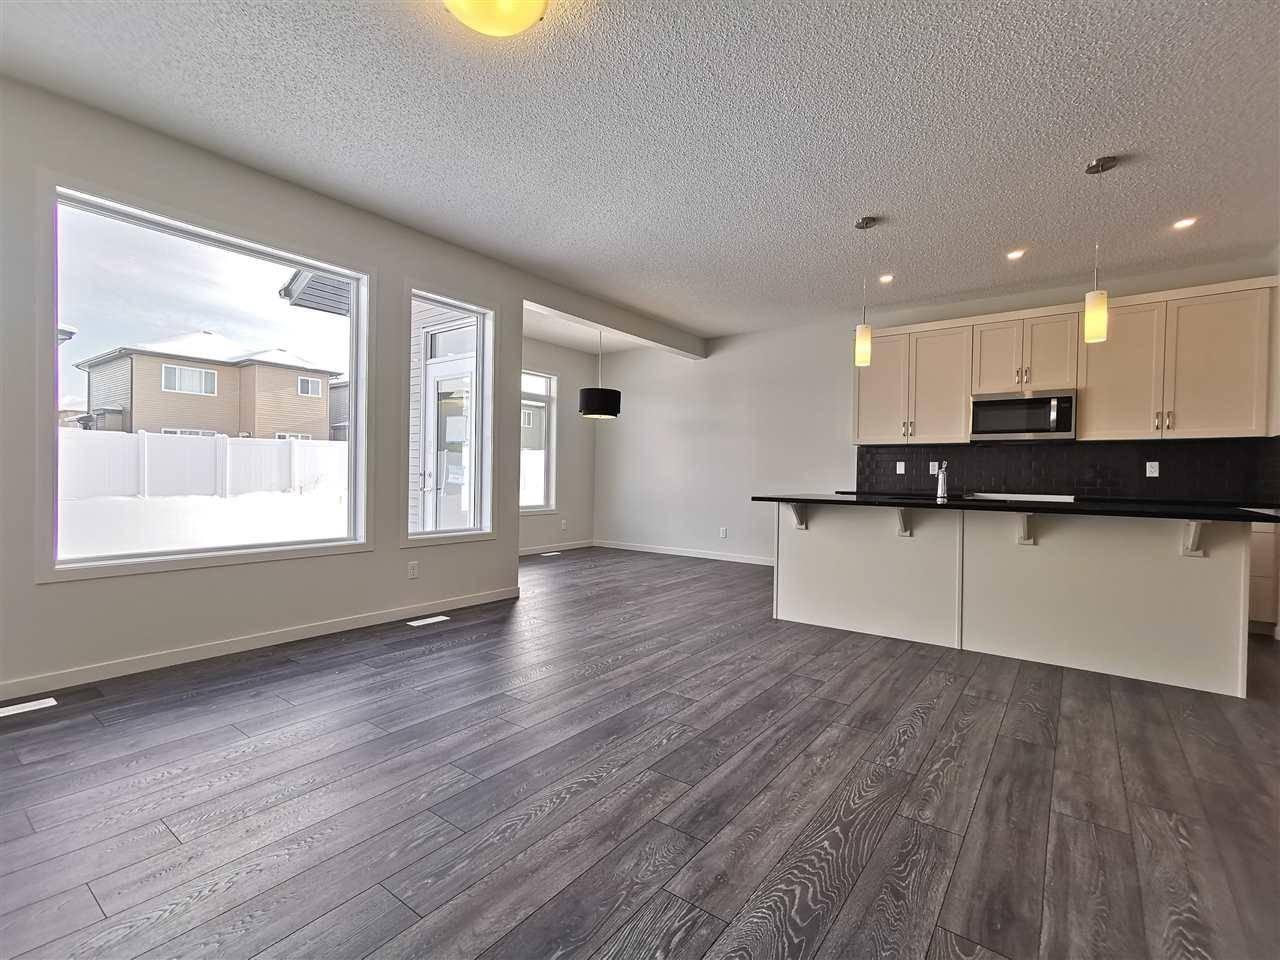 House for sale at 933 Mcconachie Blvd Nw Edmonton Alberta - MLS: E4143112